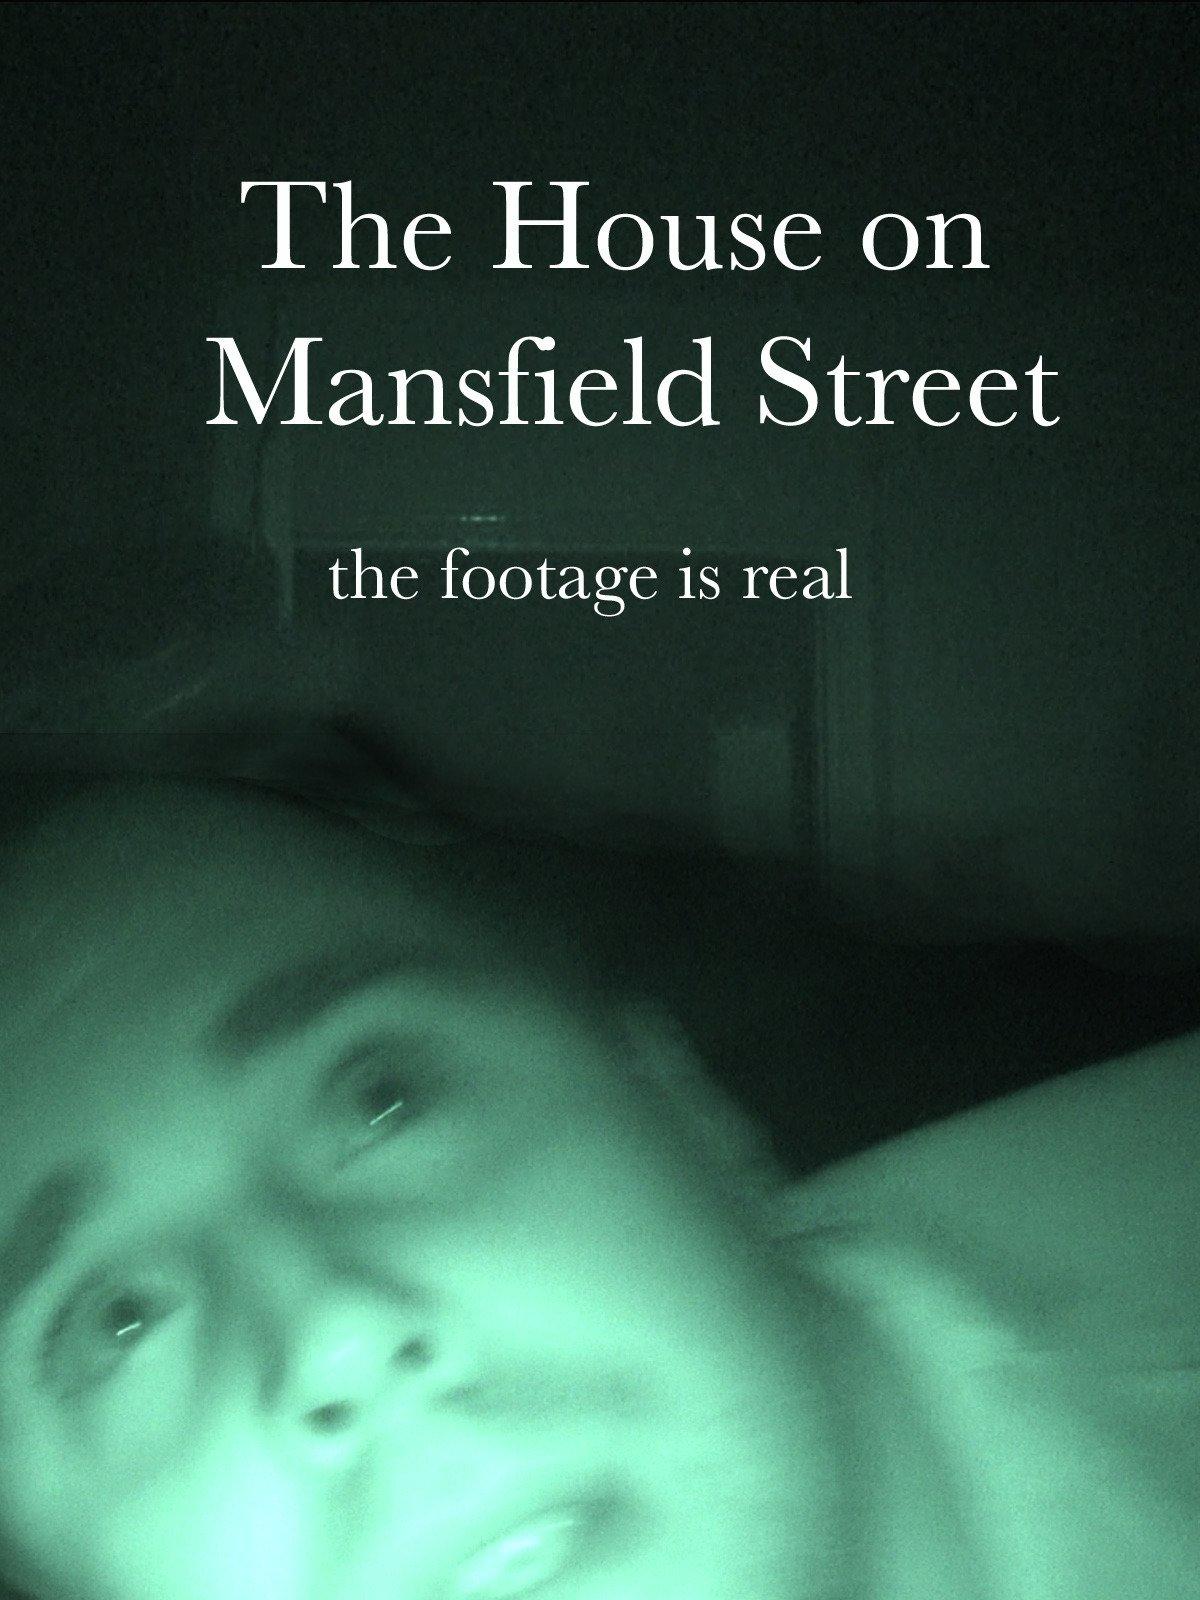 Amazon.com: The House on Mansfield Street: Matthew Hunt, Kathryn ...